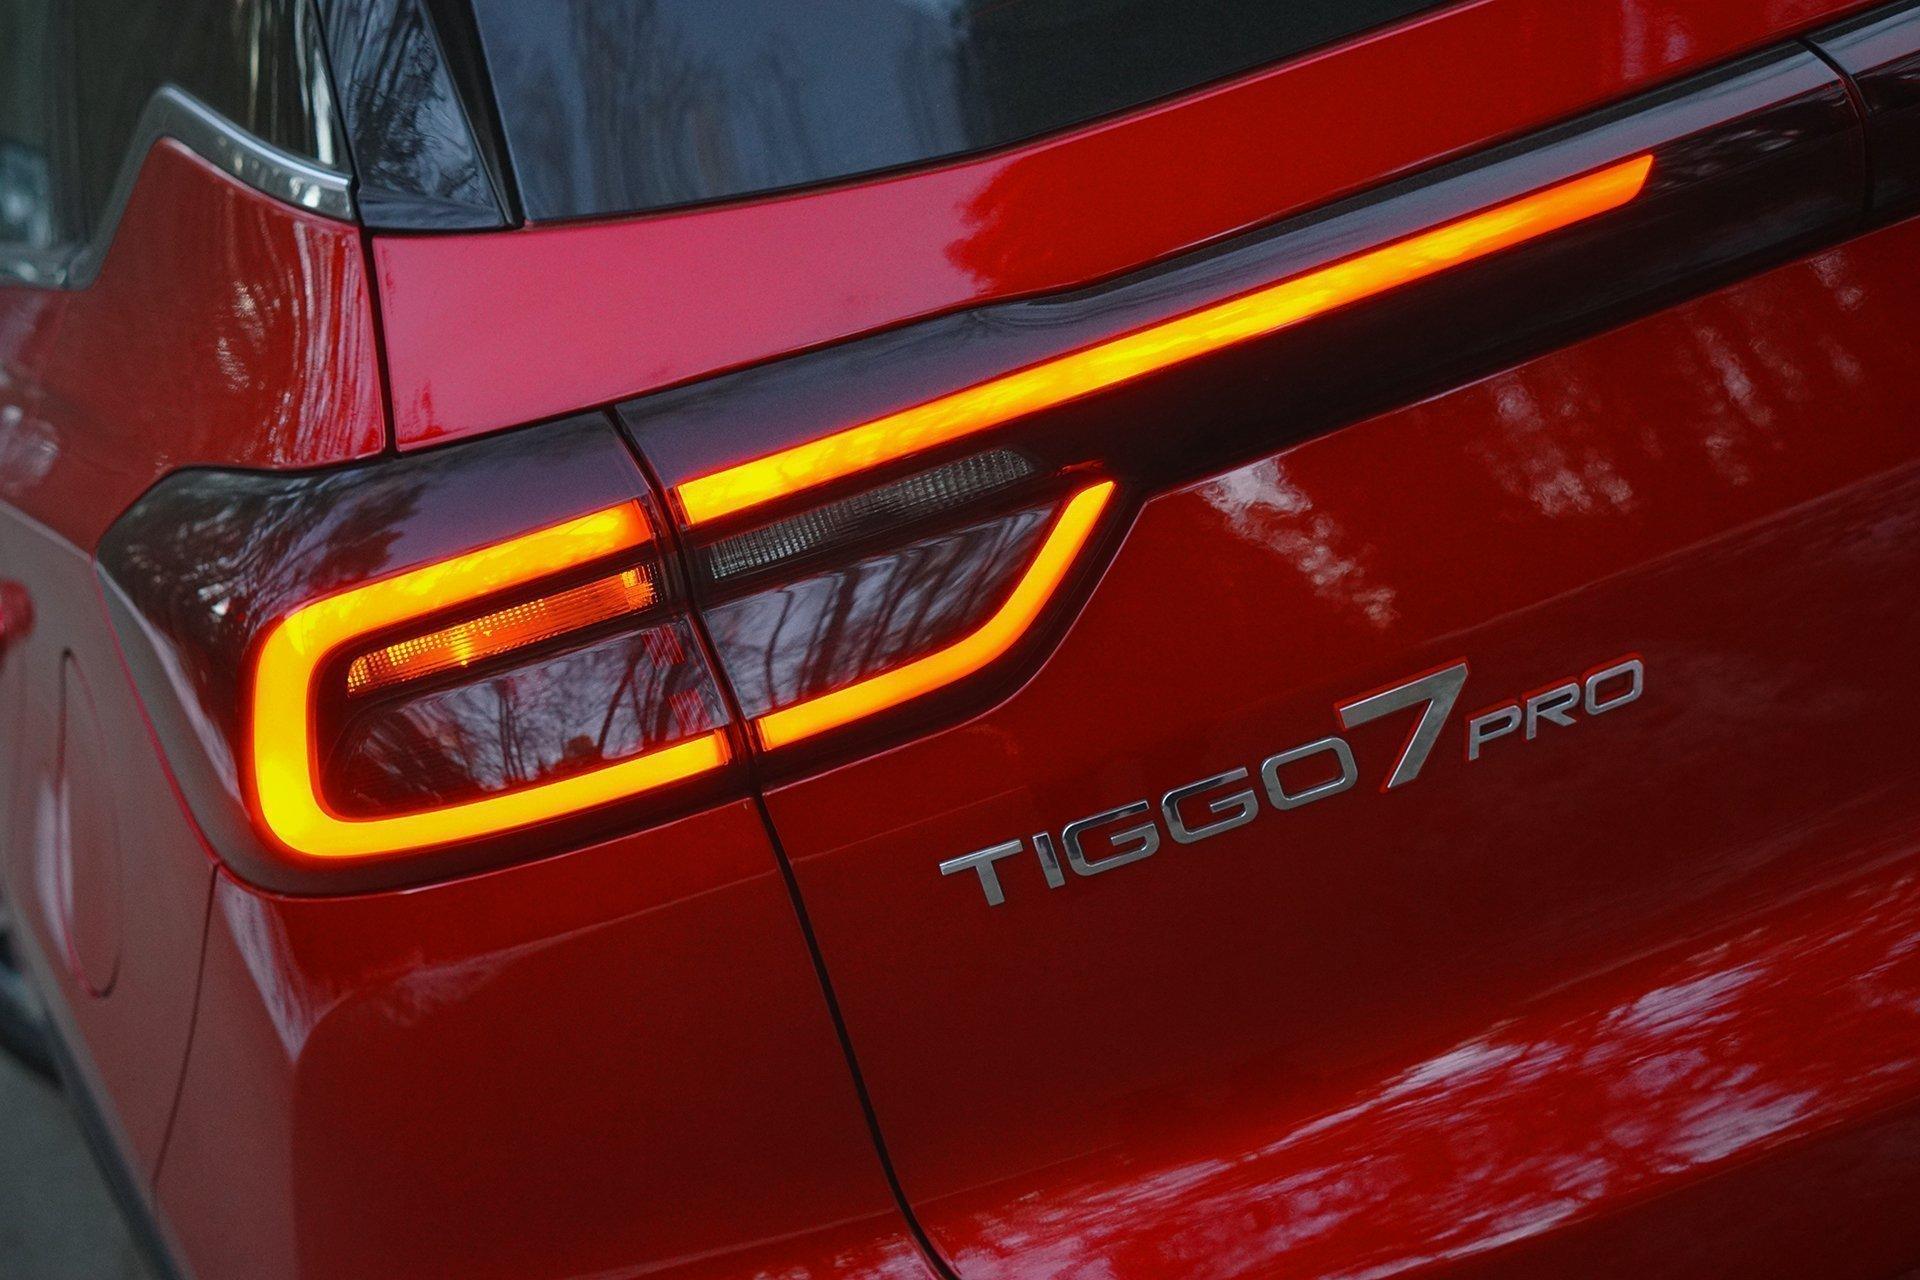 Продвинутая «семёрка»: тест Chery Tiggo 7 Pro